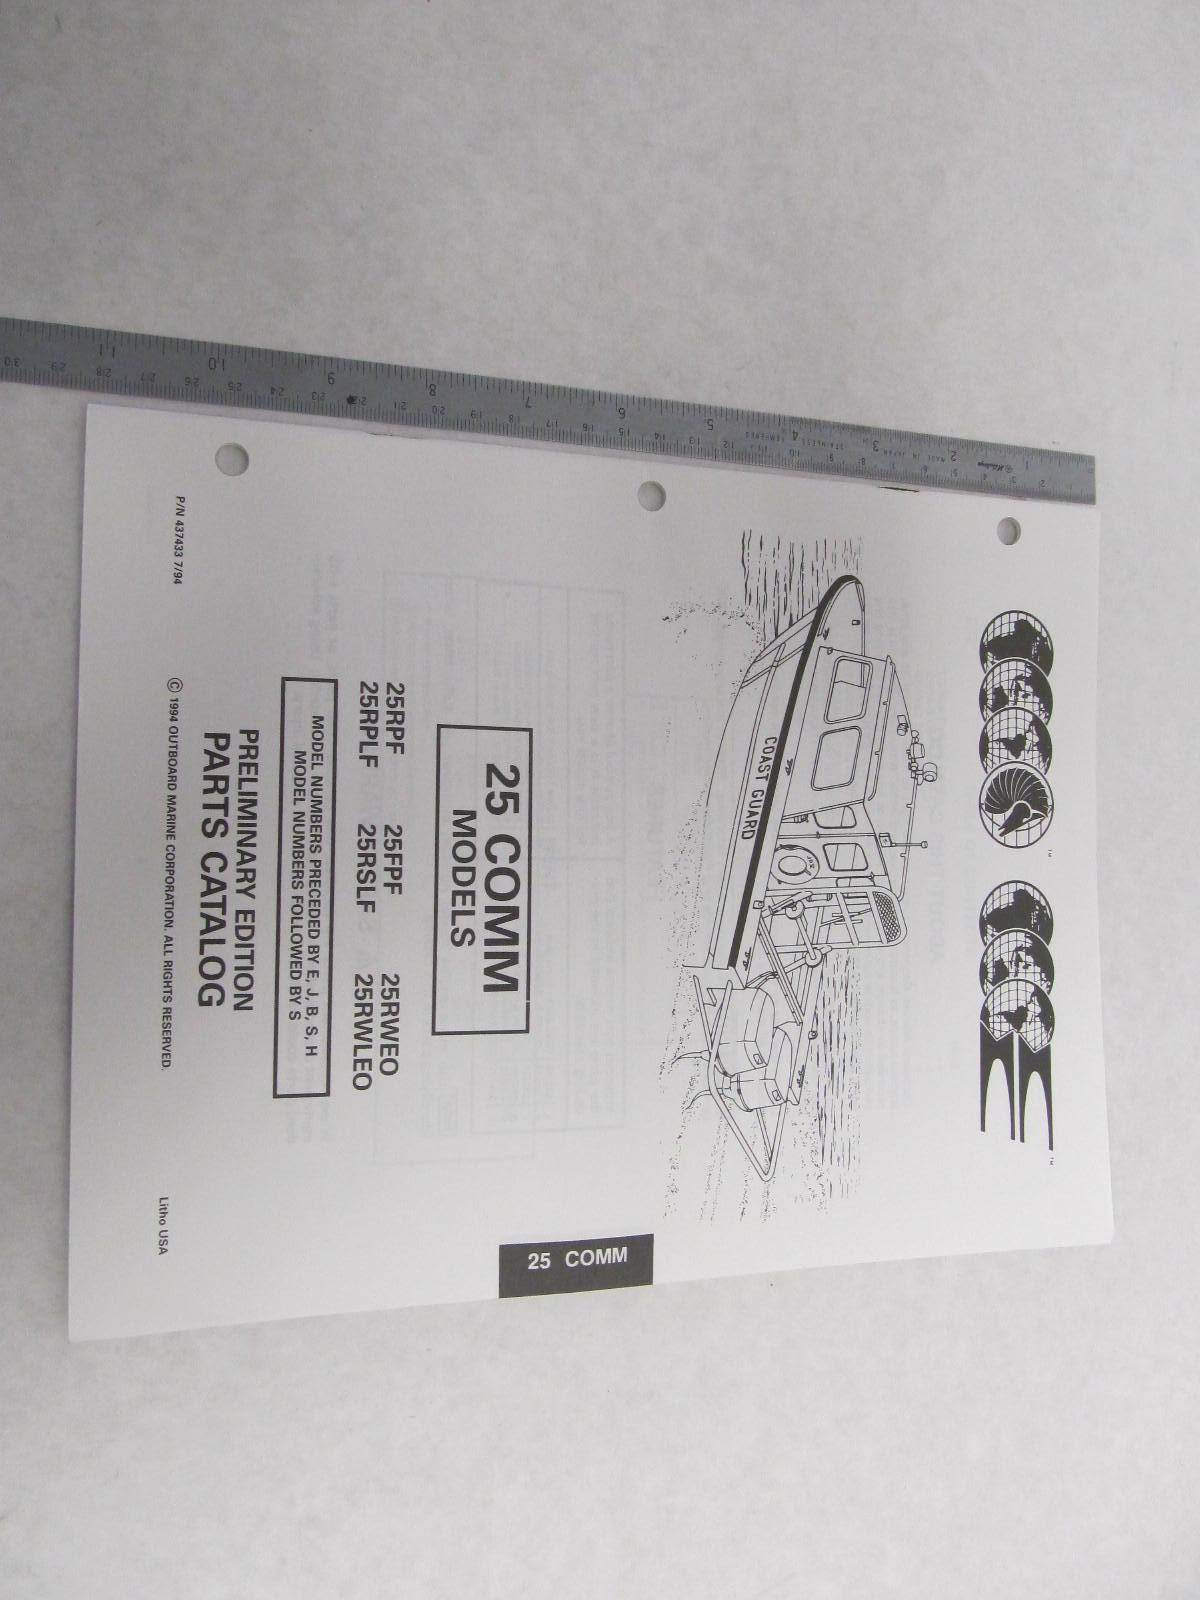 25 hp johnson outboard parts diagram 240 volt motor wiring 1995 evinrude catalog comm